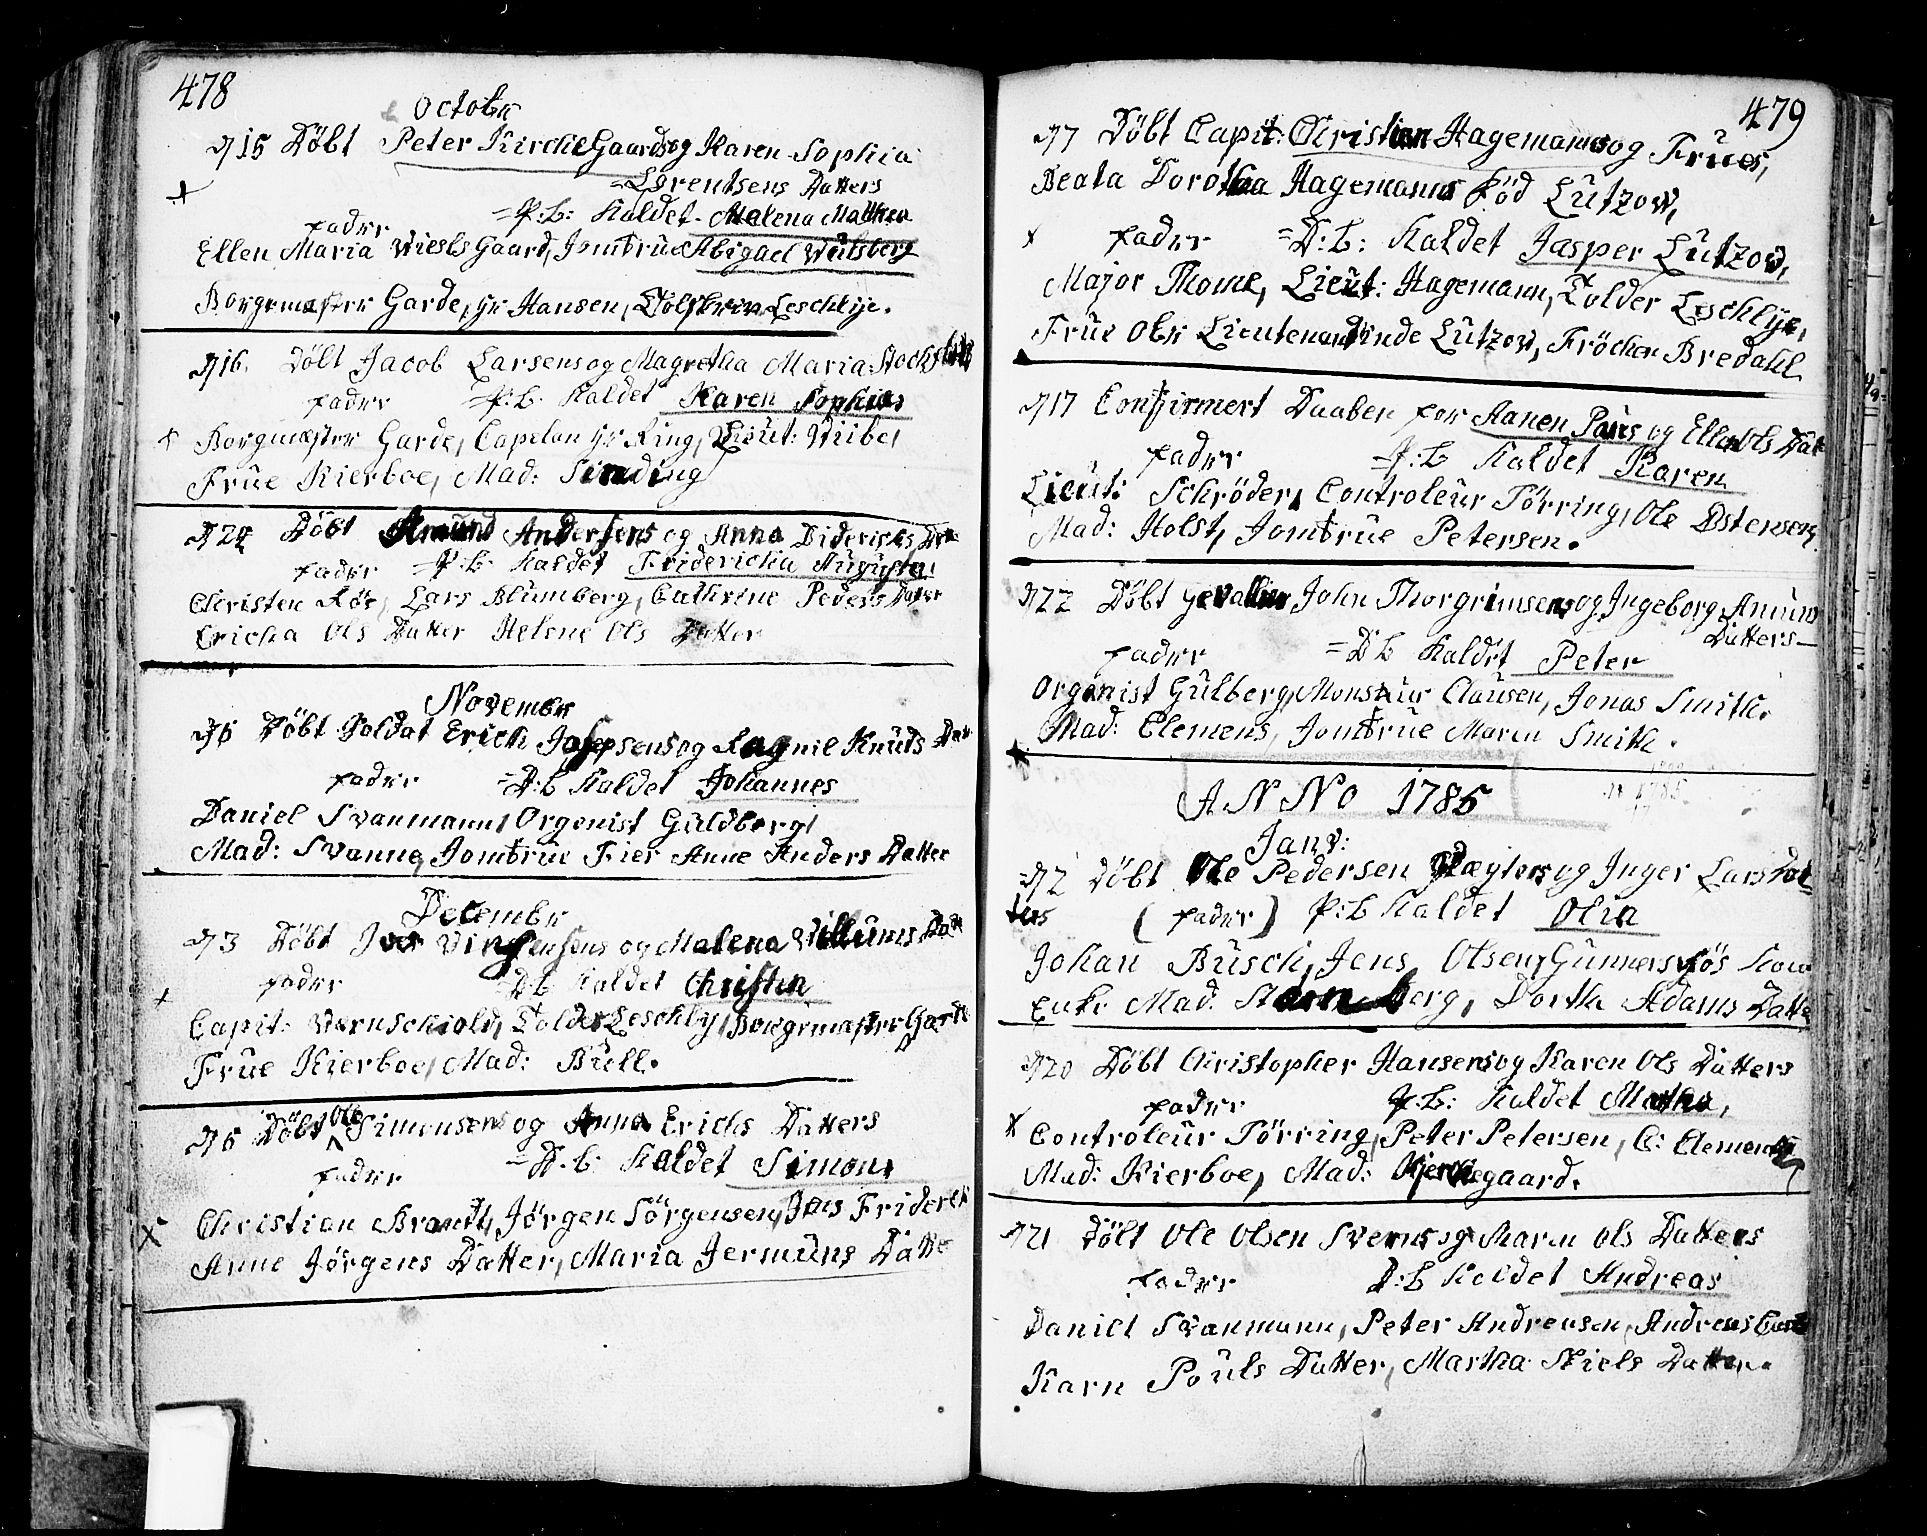 SAO, Fredrikstad prestekontor Kirkebøker, F/Fa/L0002: Ministerialbok nr. 2, 1750-1804, s. 478-479